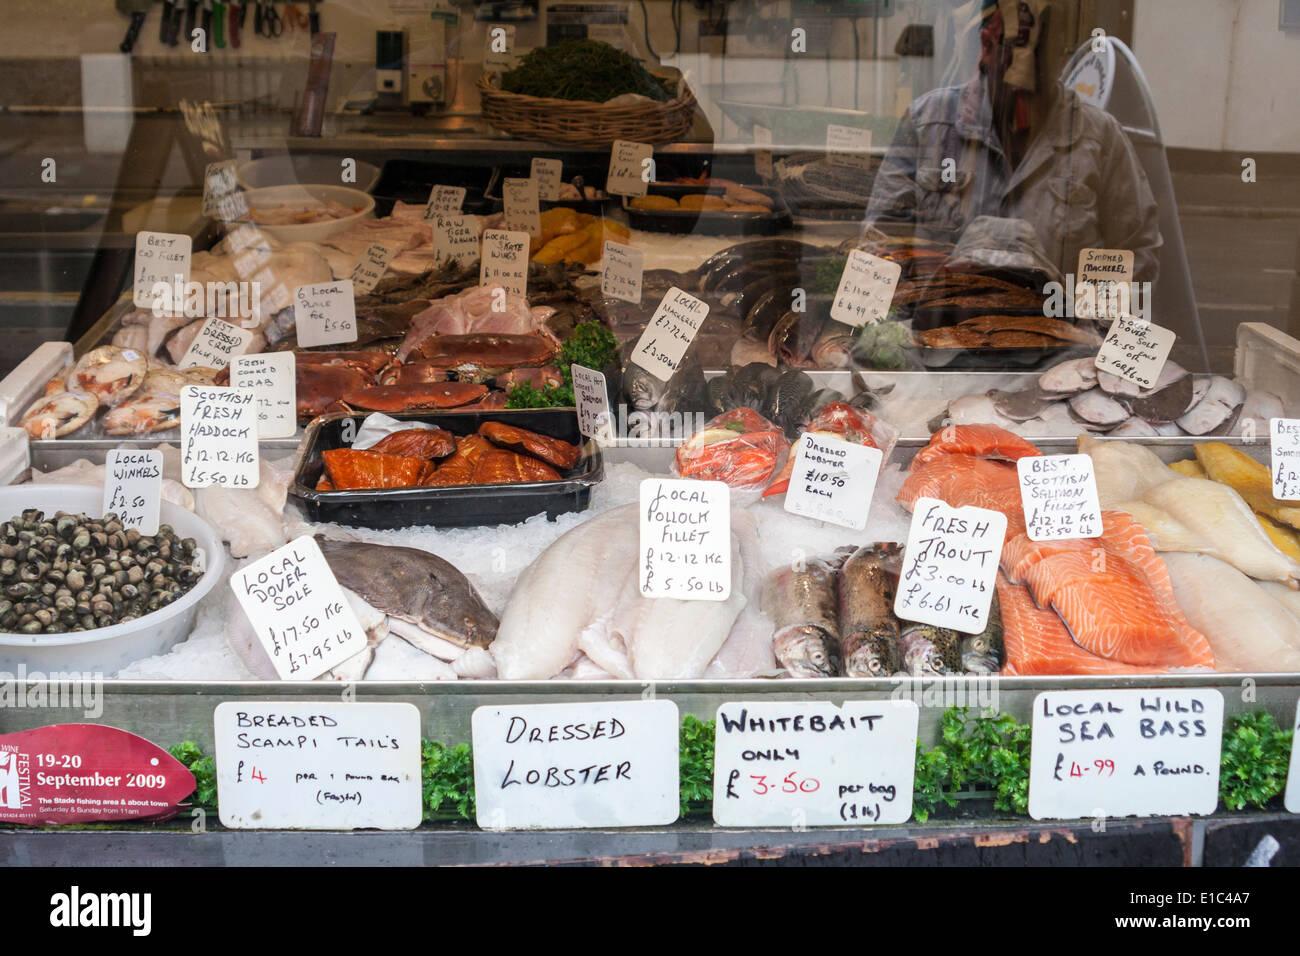 Local fresh fish fishmonger's shop window display, Hastings, Sussex, England, GB, UK - Stock Image